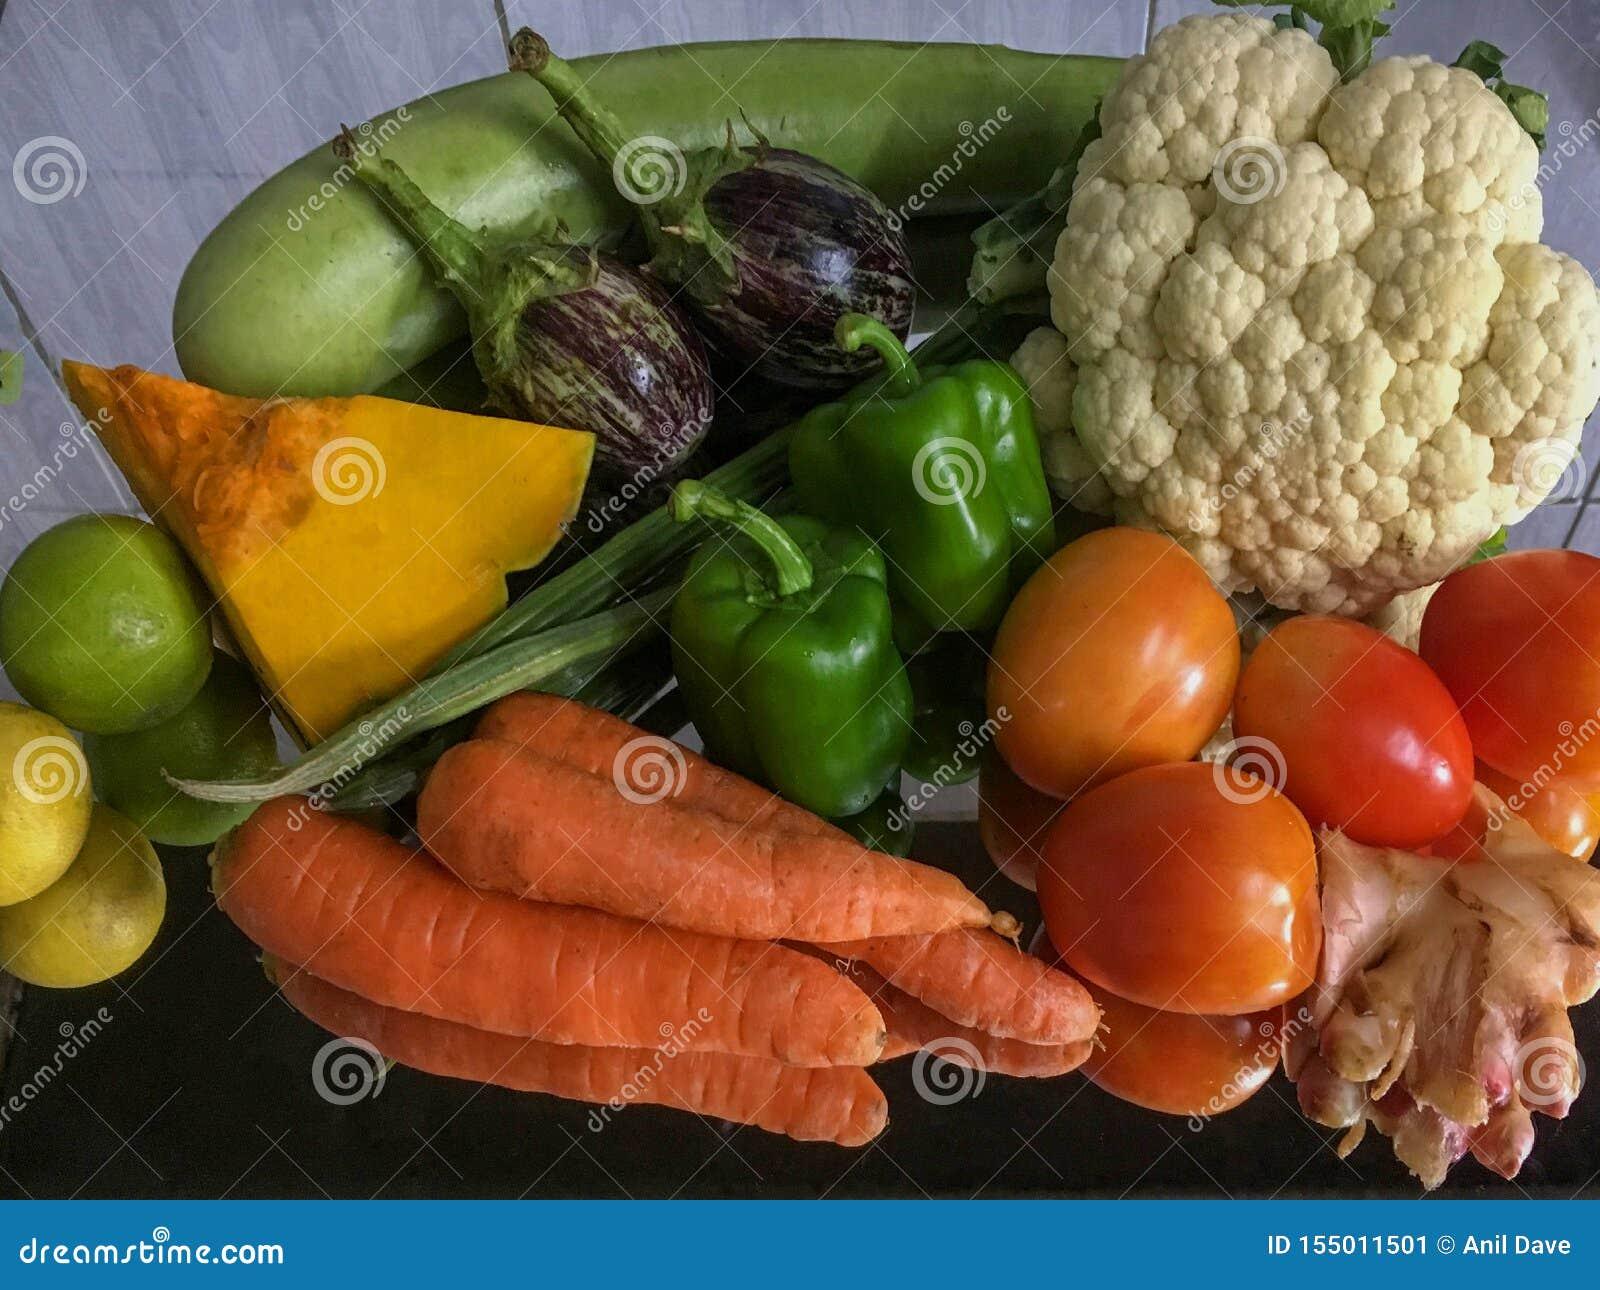 Assortment of fresh fruits and vegetables Lock Gram kalyan maharashtra